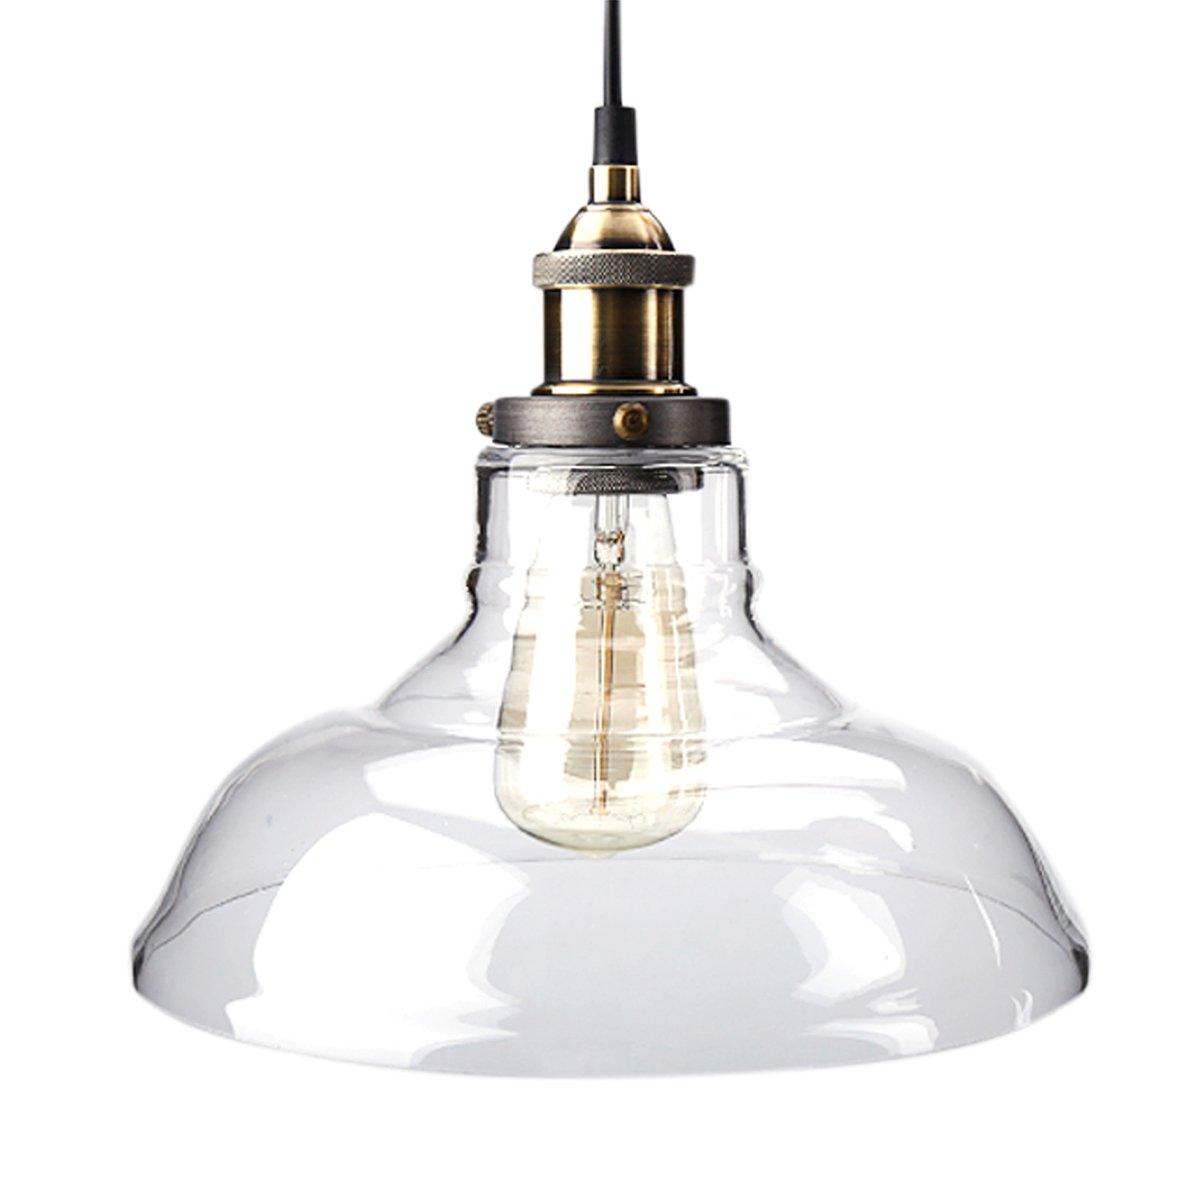 Pendant Light Zhma Industrial Style 1 Light Pendant Glass Hanging